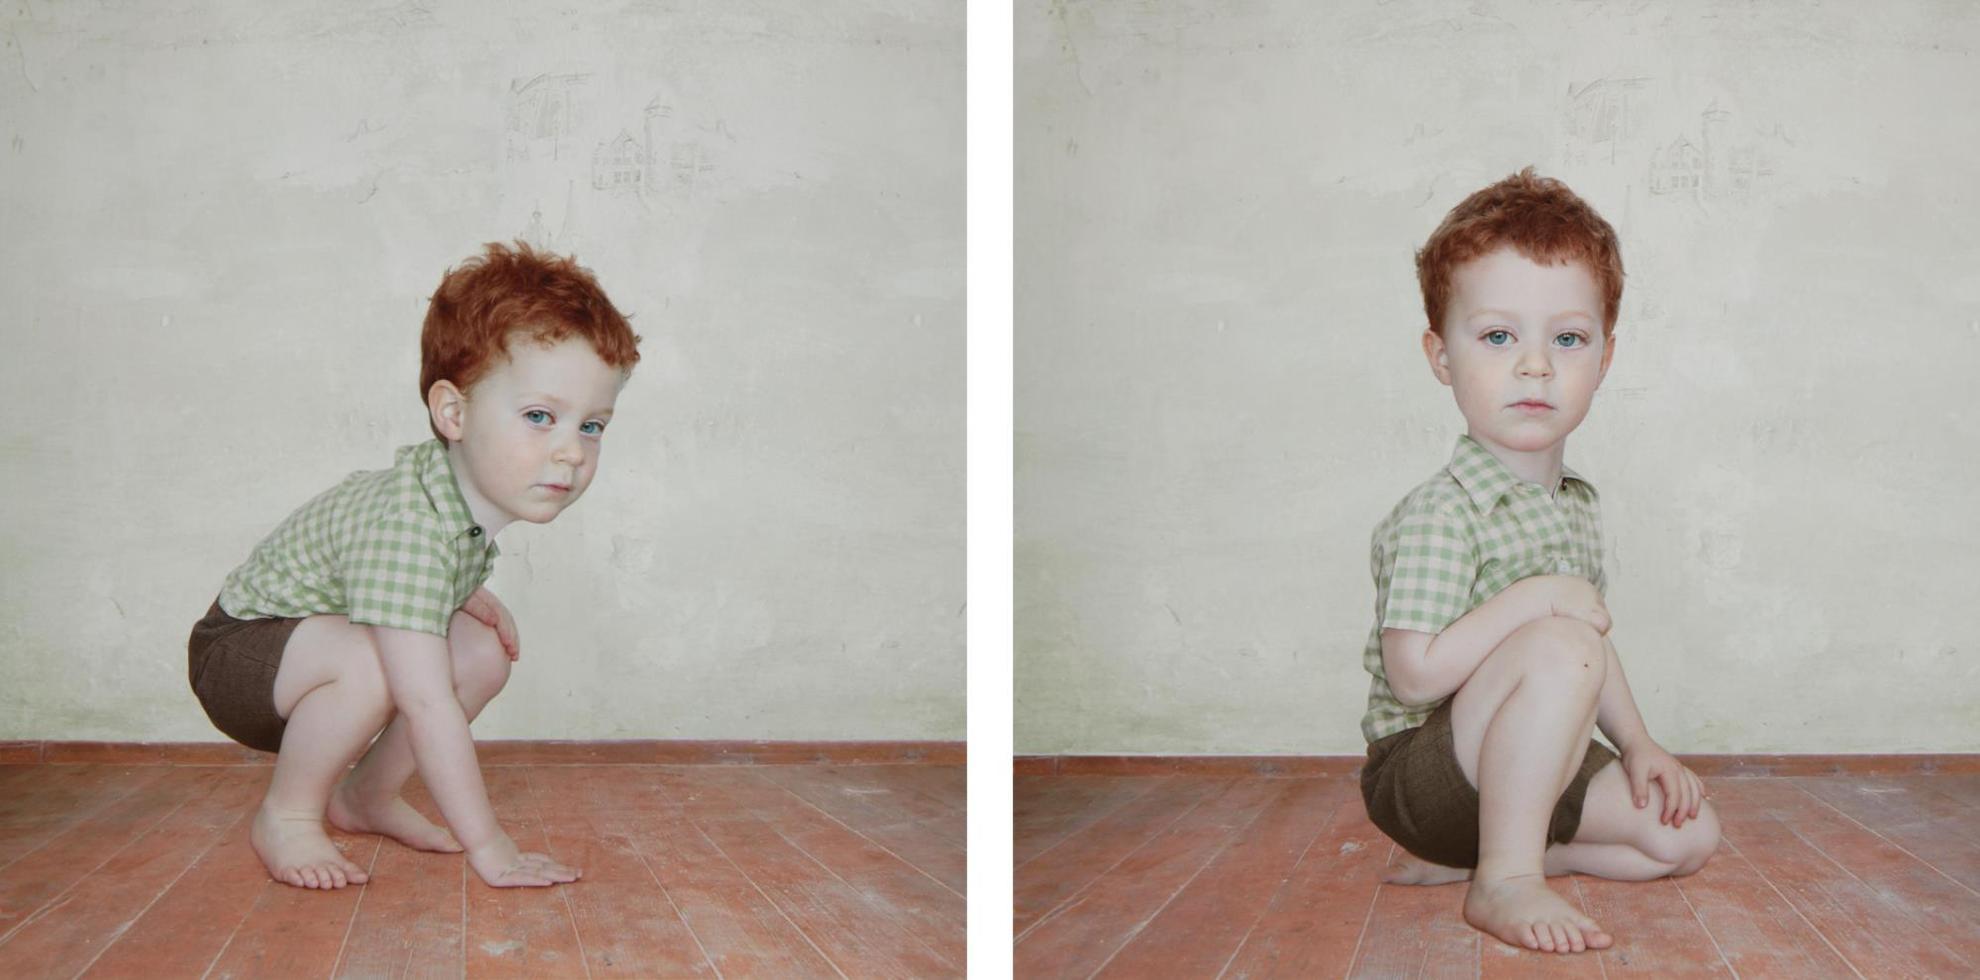 Loretta Lux-Study Of Boy 1 And Study Of Boy 2-2002